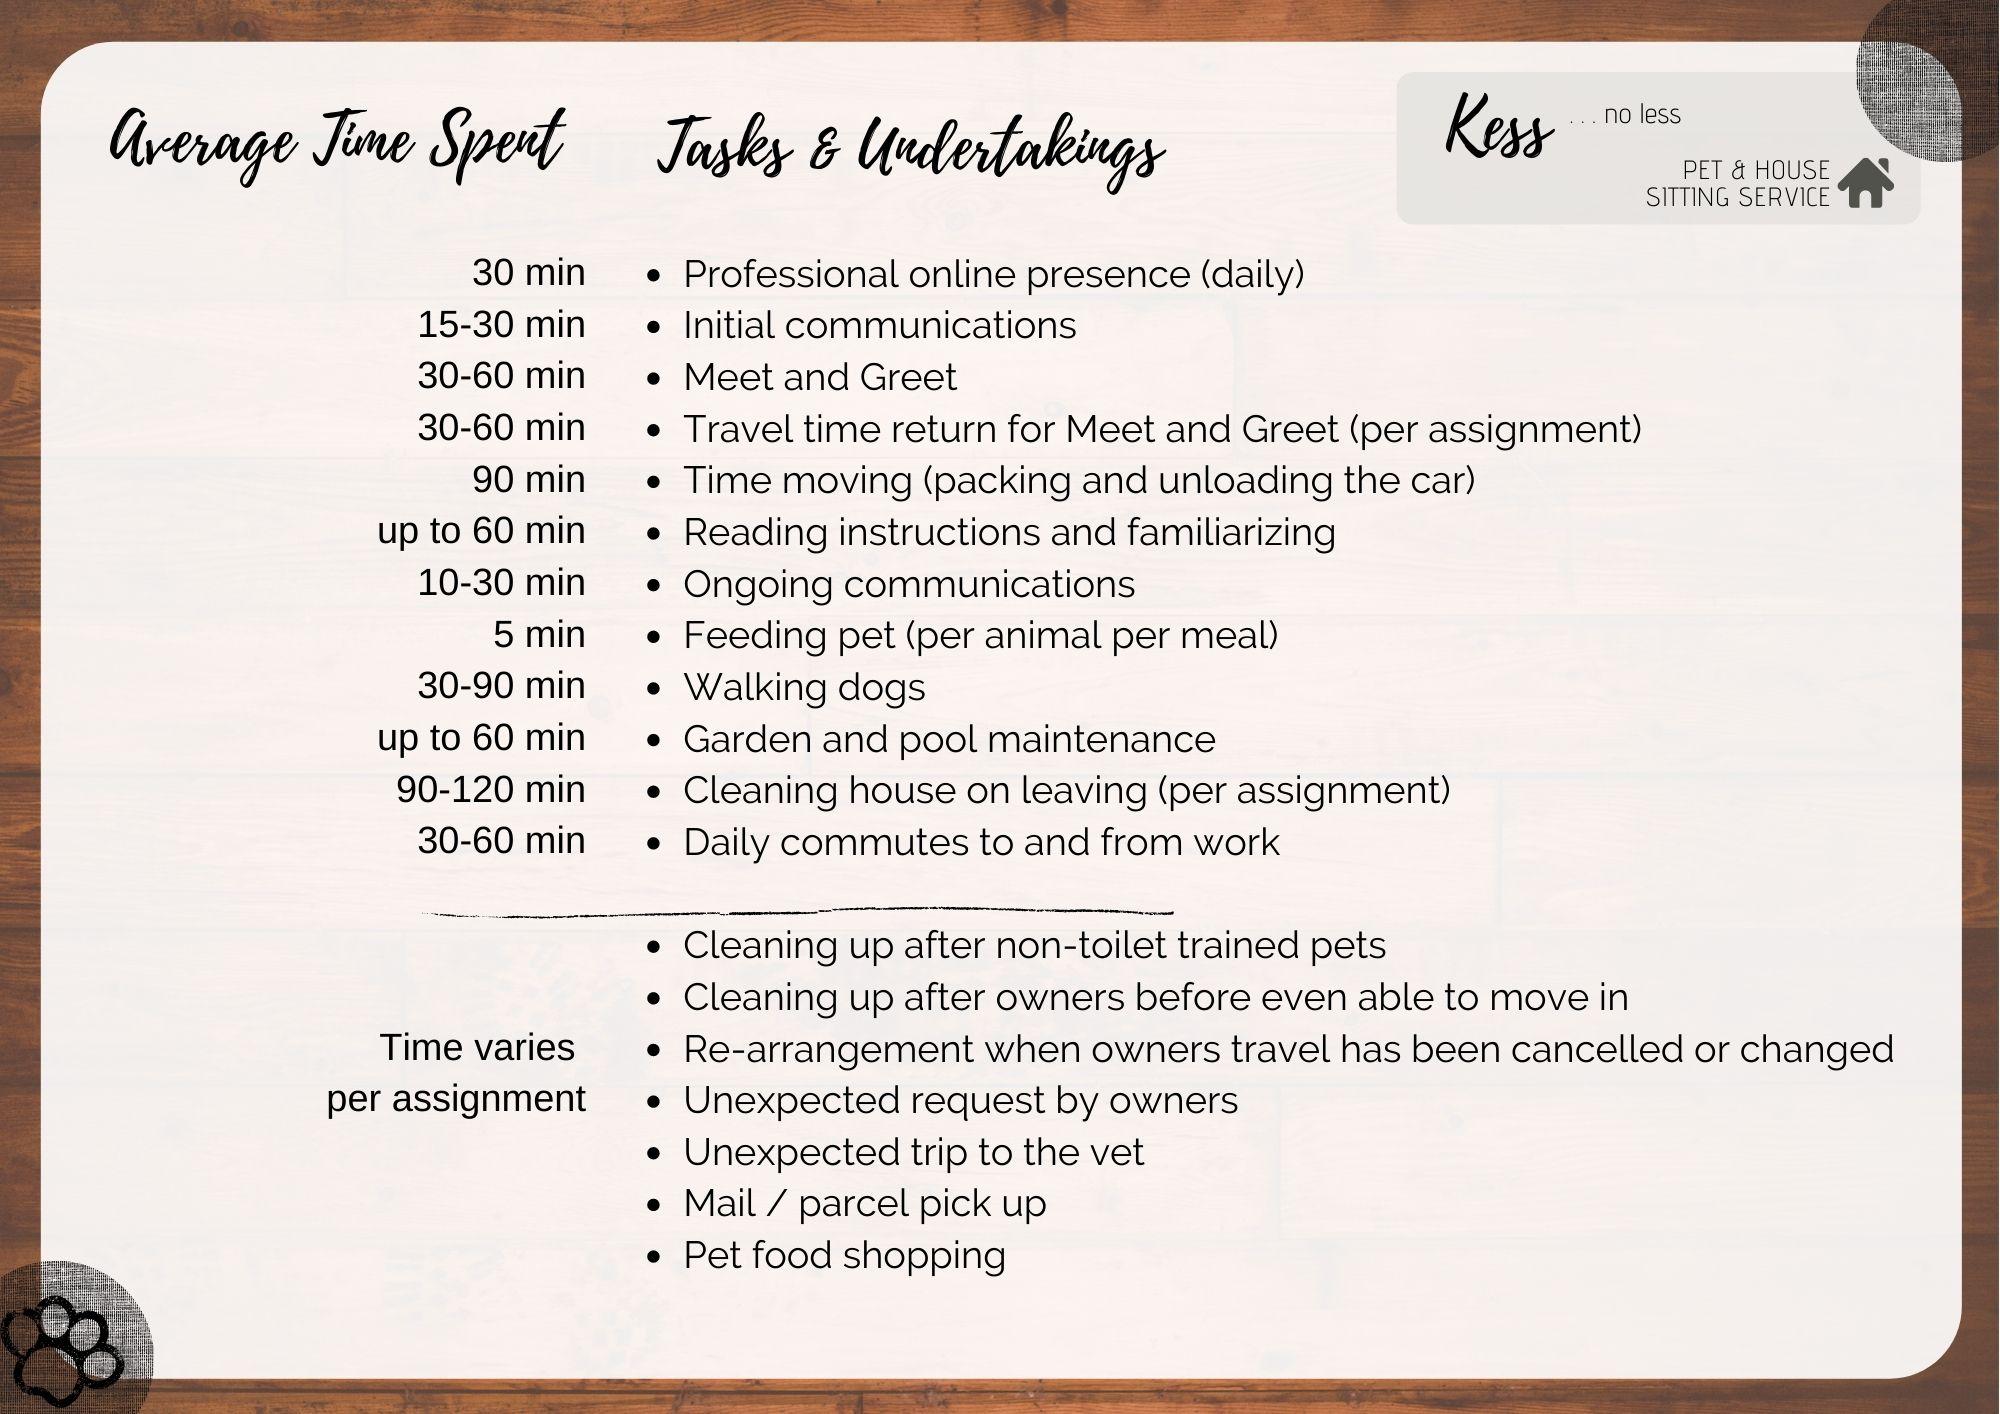 House sitter tasks and undertakings